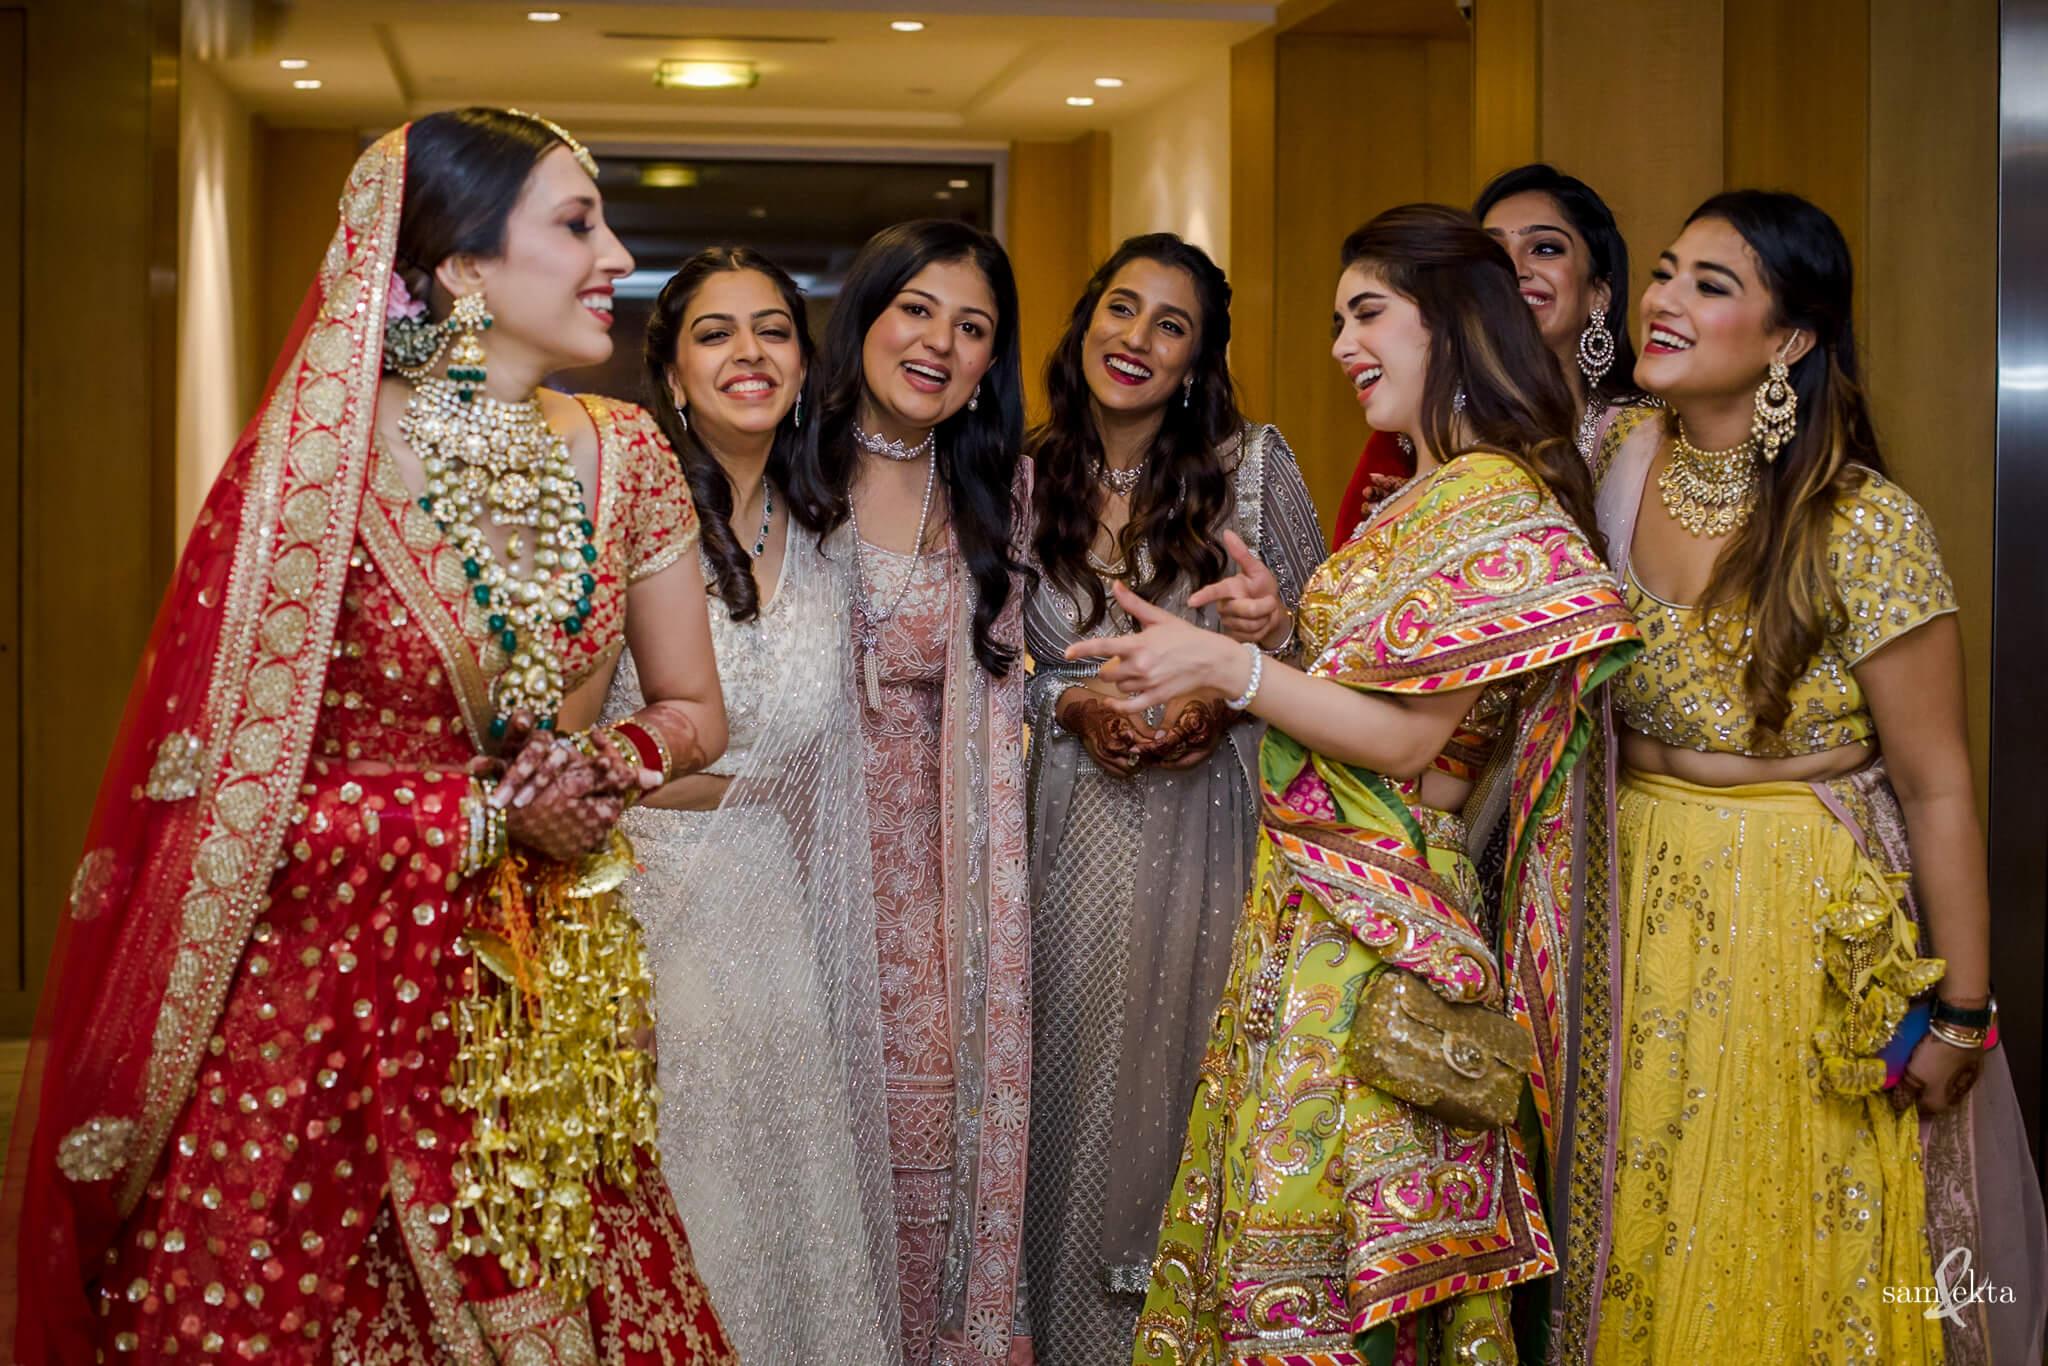 bridesmaids, Armaan Jain And Anissa Malhotra's Wedding